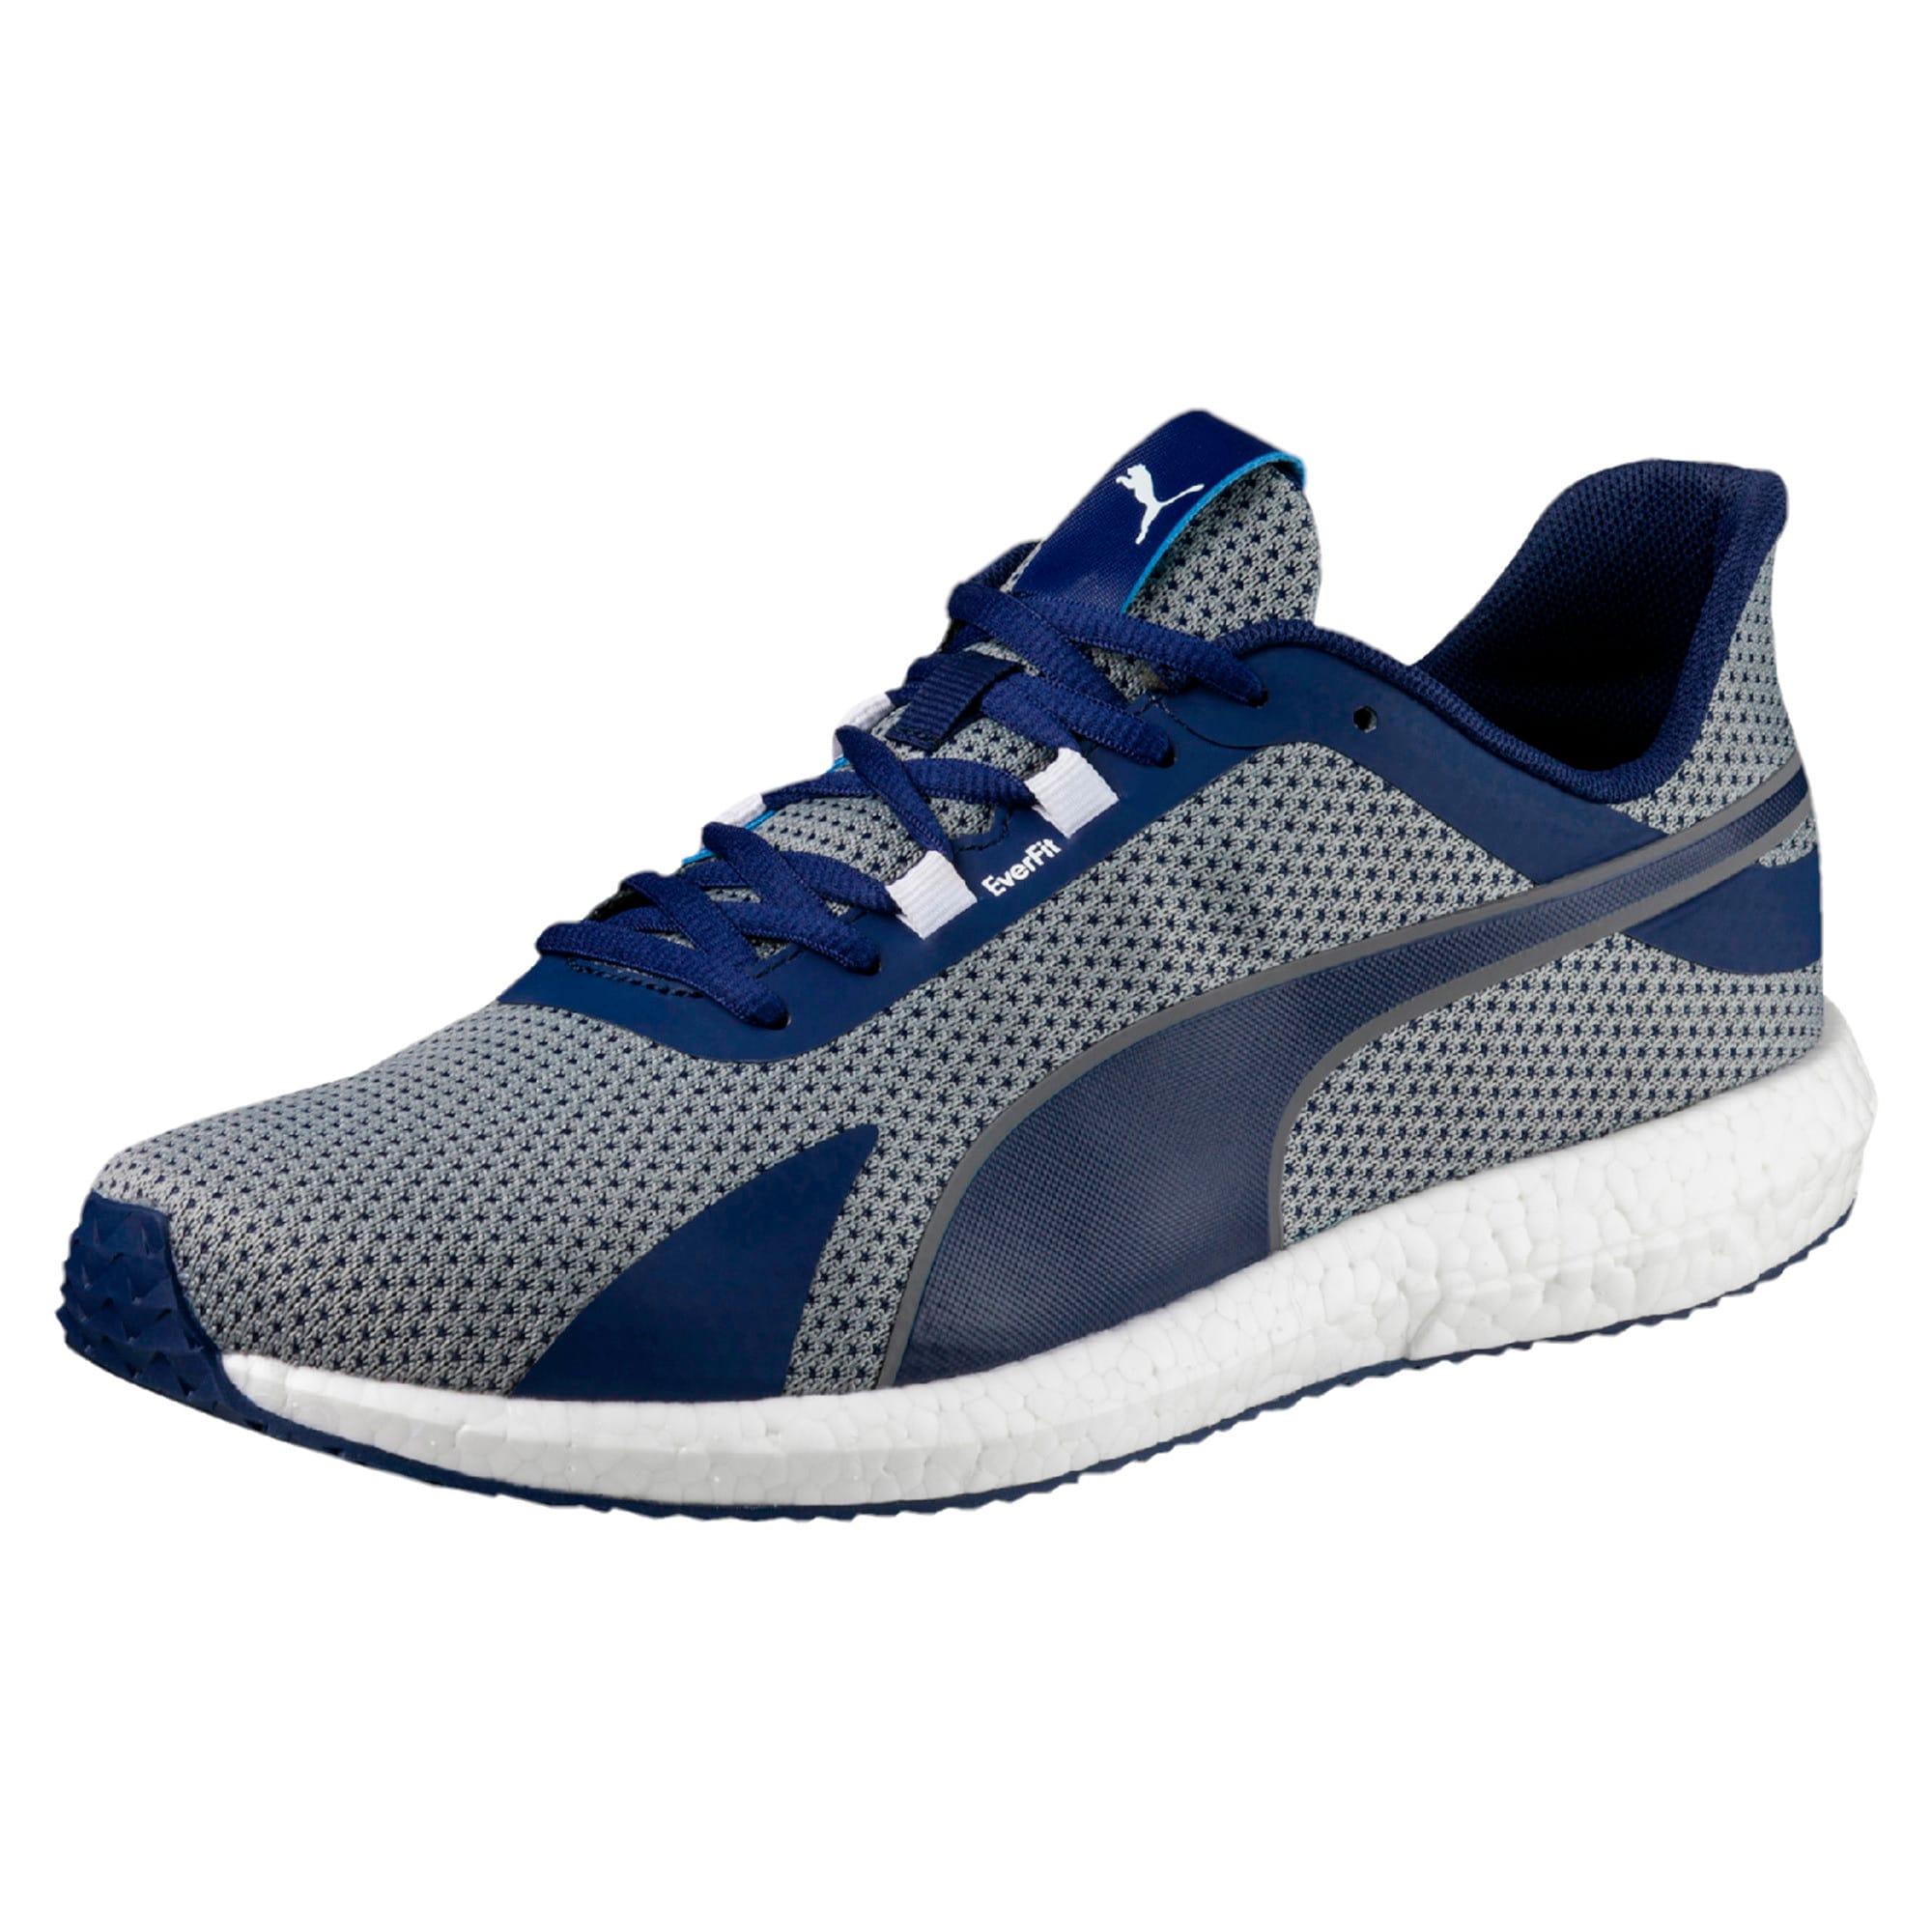 Thumbnail 1 of Mega NRGY Turbo Men's Running Shoes, Blue Depths-Puma White, medium-IND